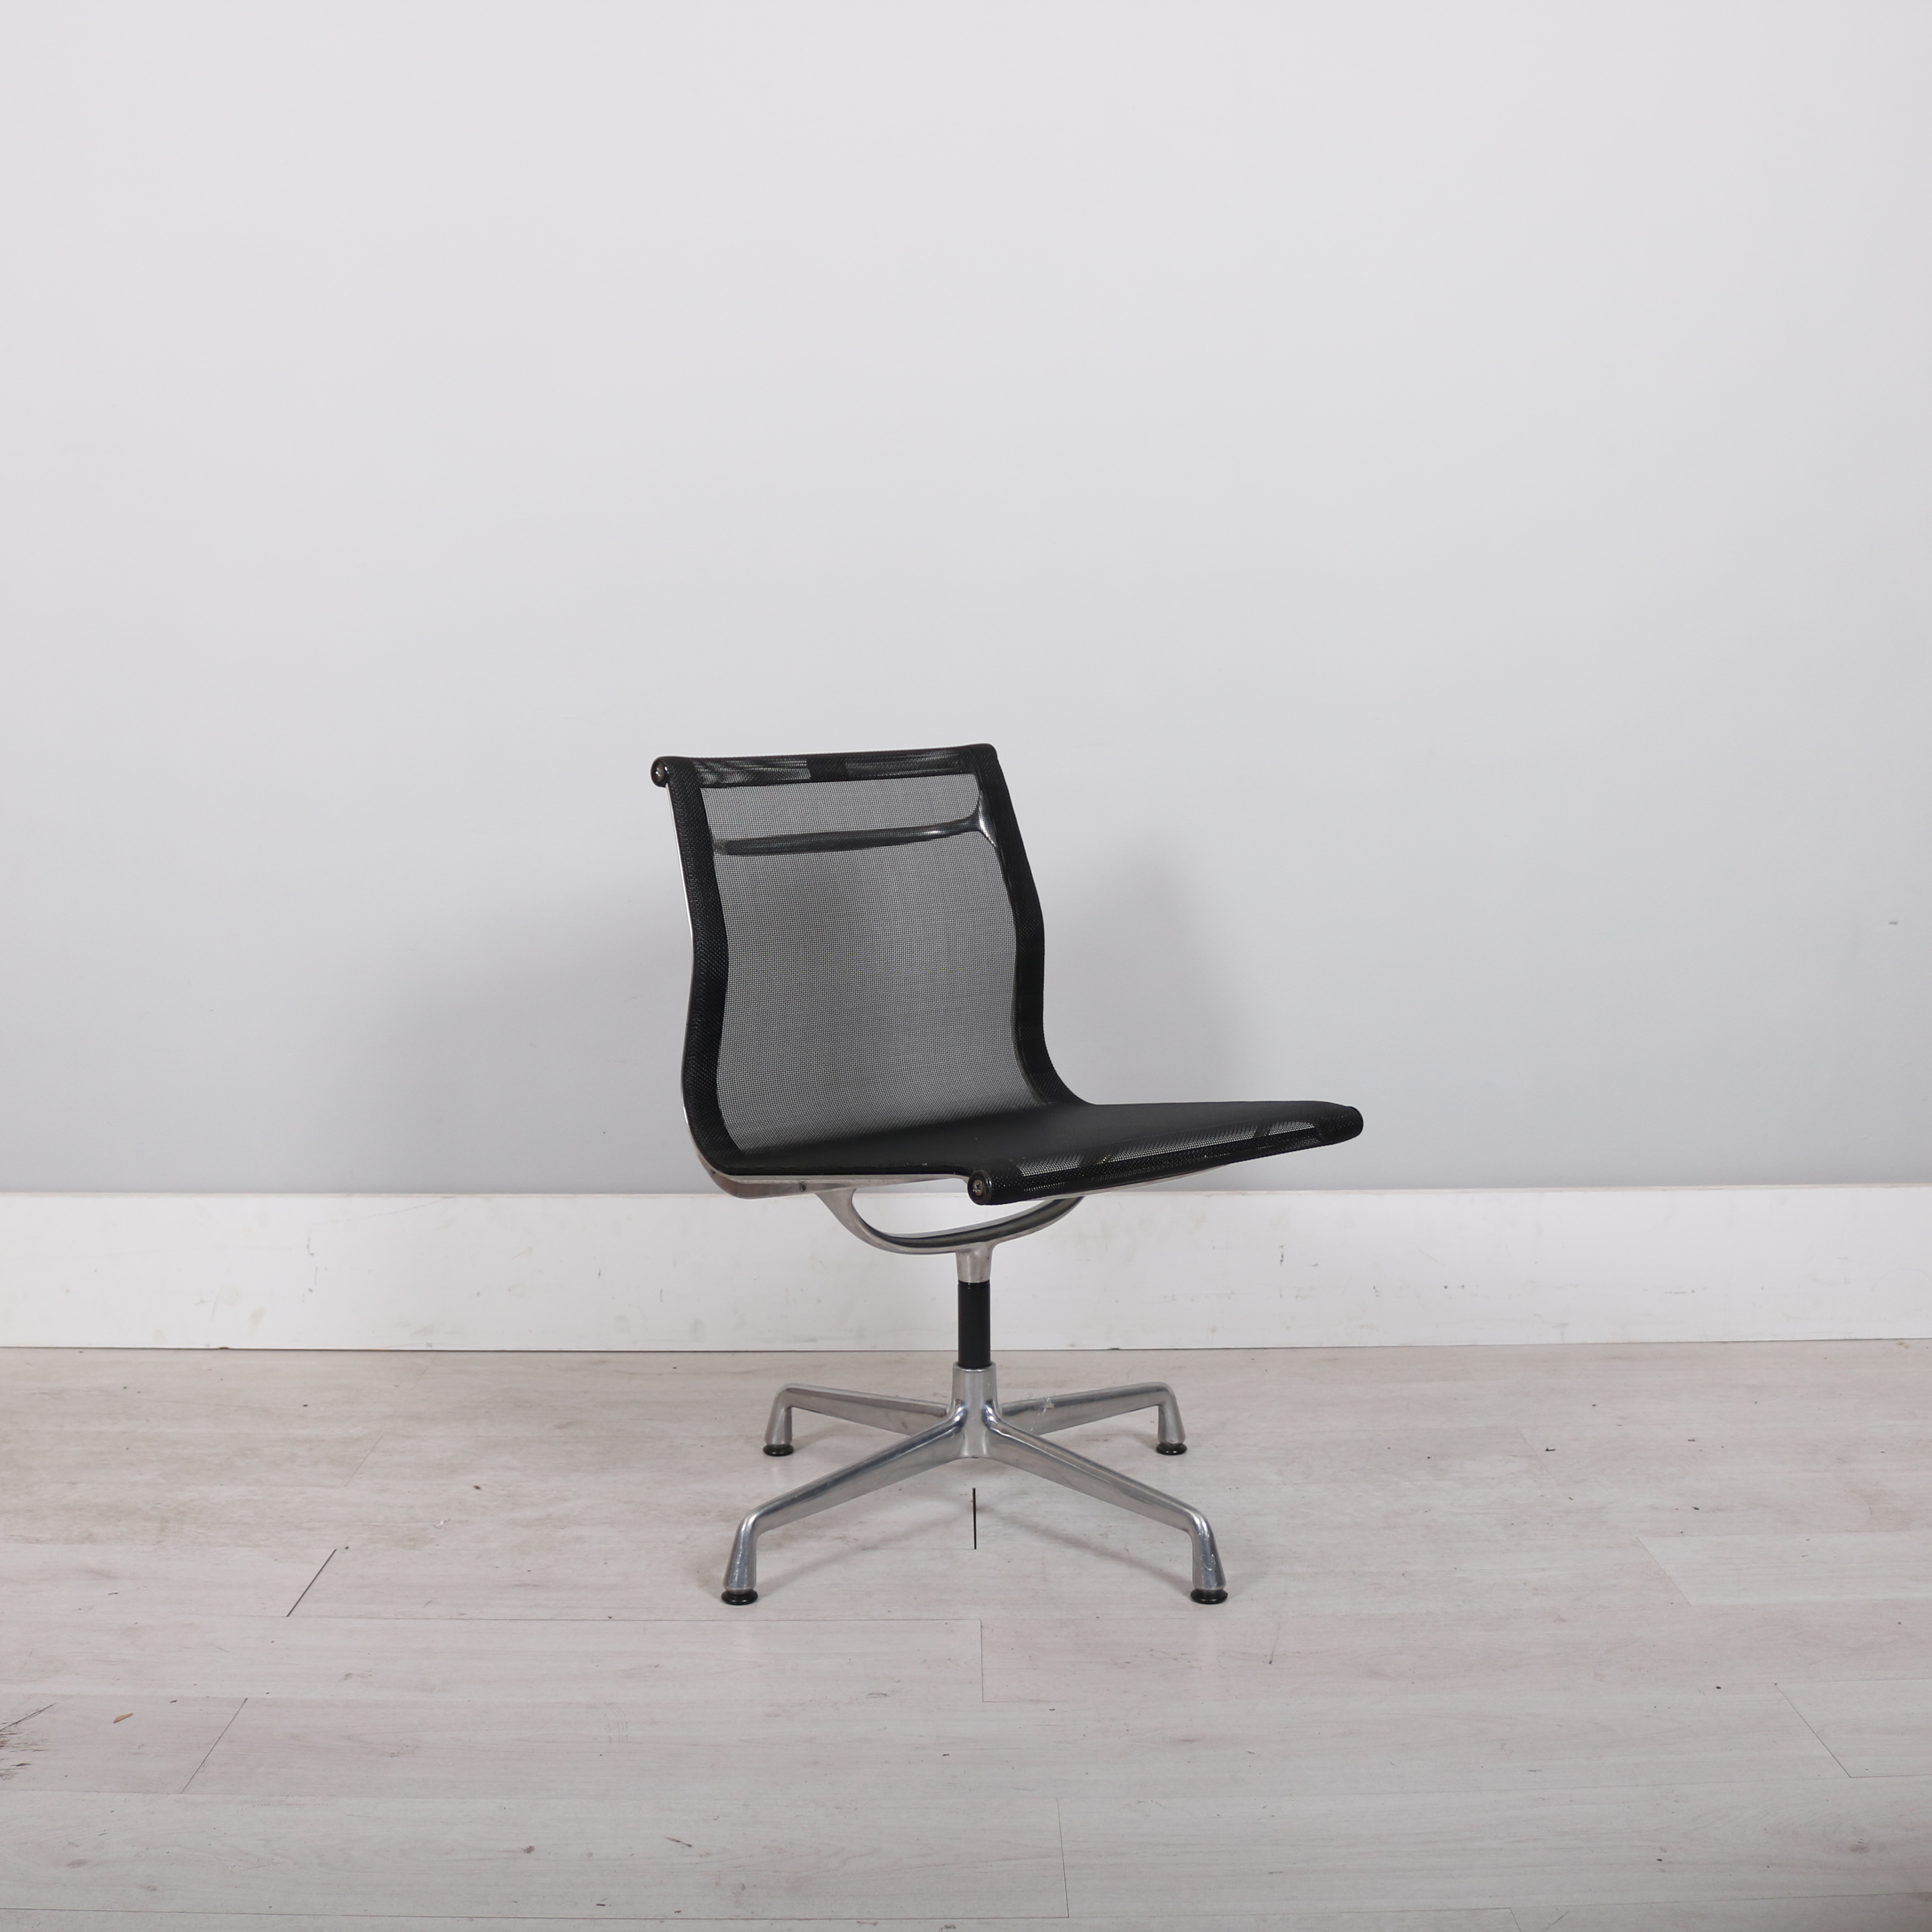 vitra charles ray eames ea105 studiomodern. Black Bedroom Furniture Sets. Home Design Ideas